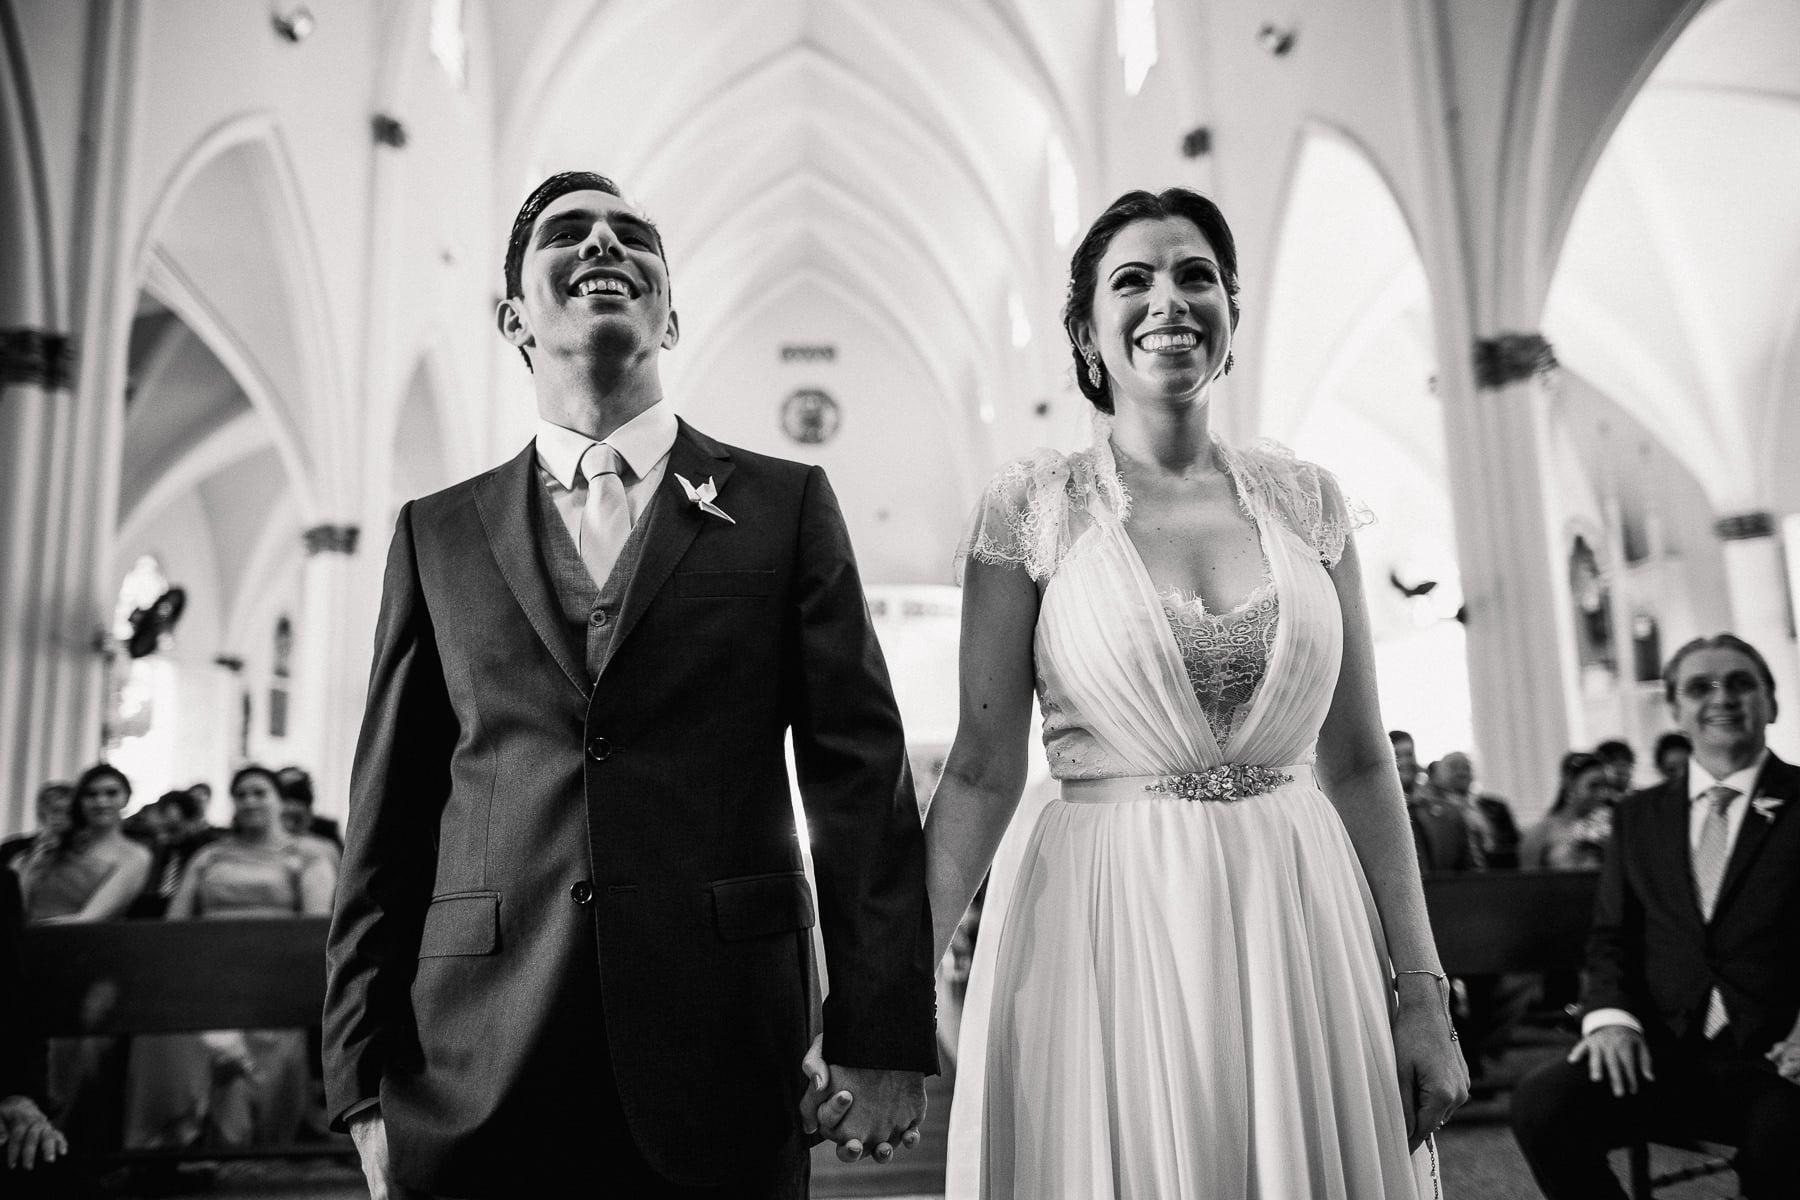 casamento-igreja-do-cristo-rei-fortaleza-25